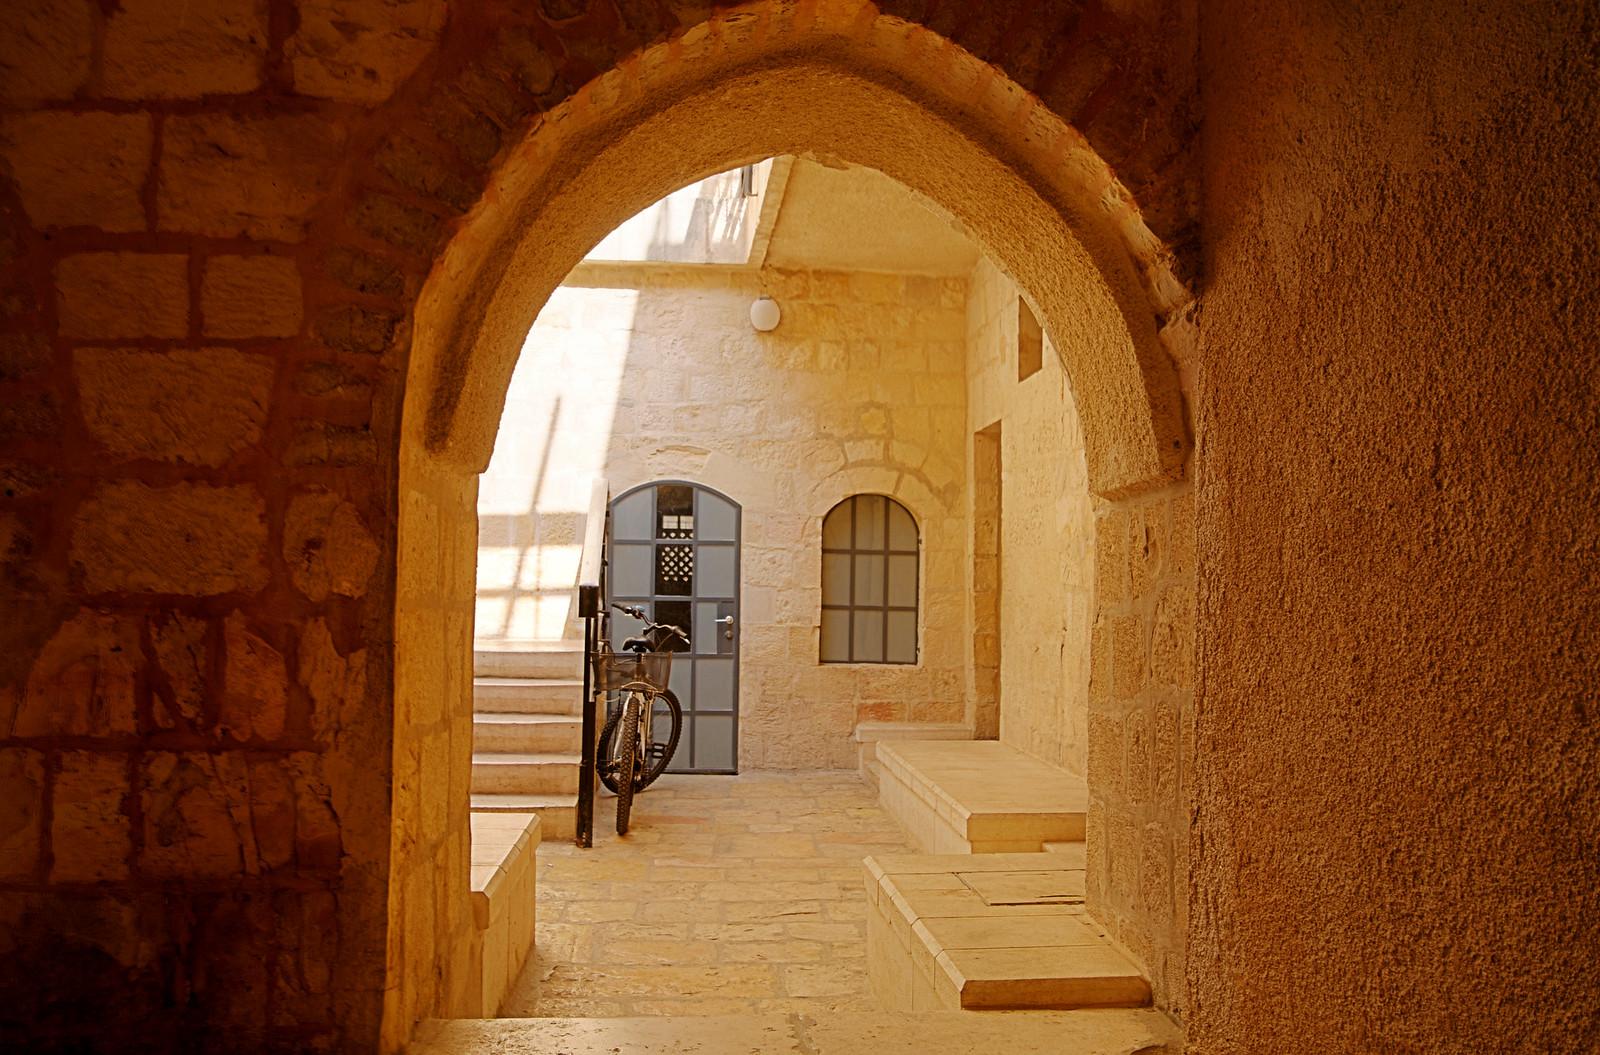 Jerusalem_Old City_Jewish Quater_5_Noam Chen_IMOT